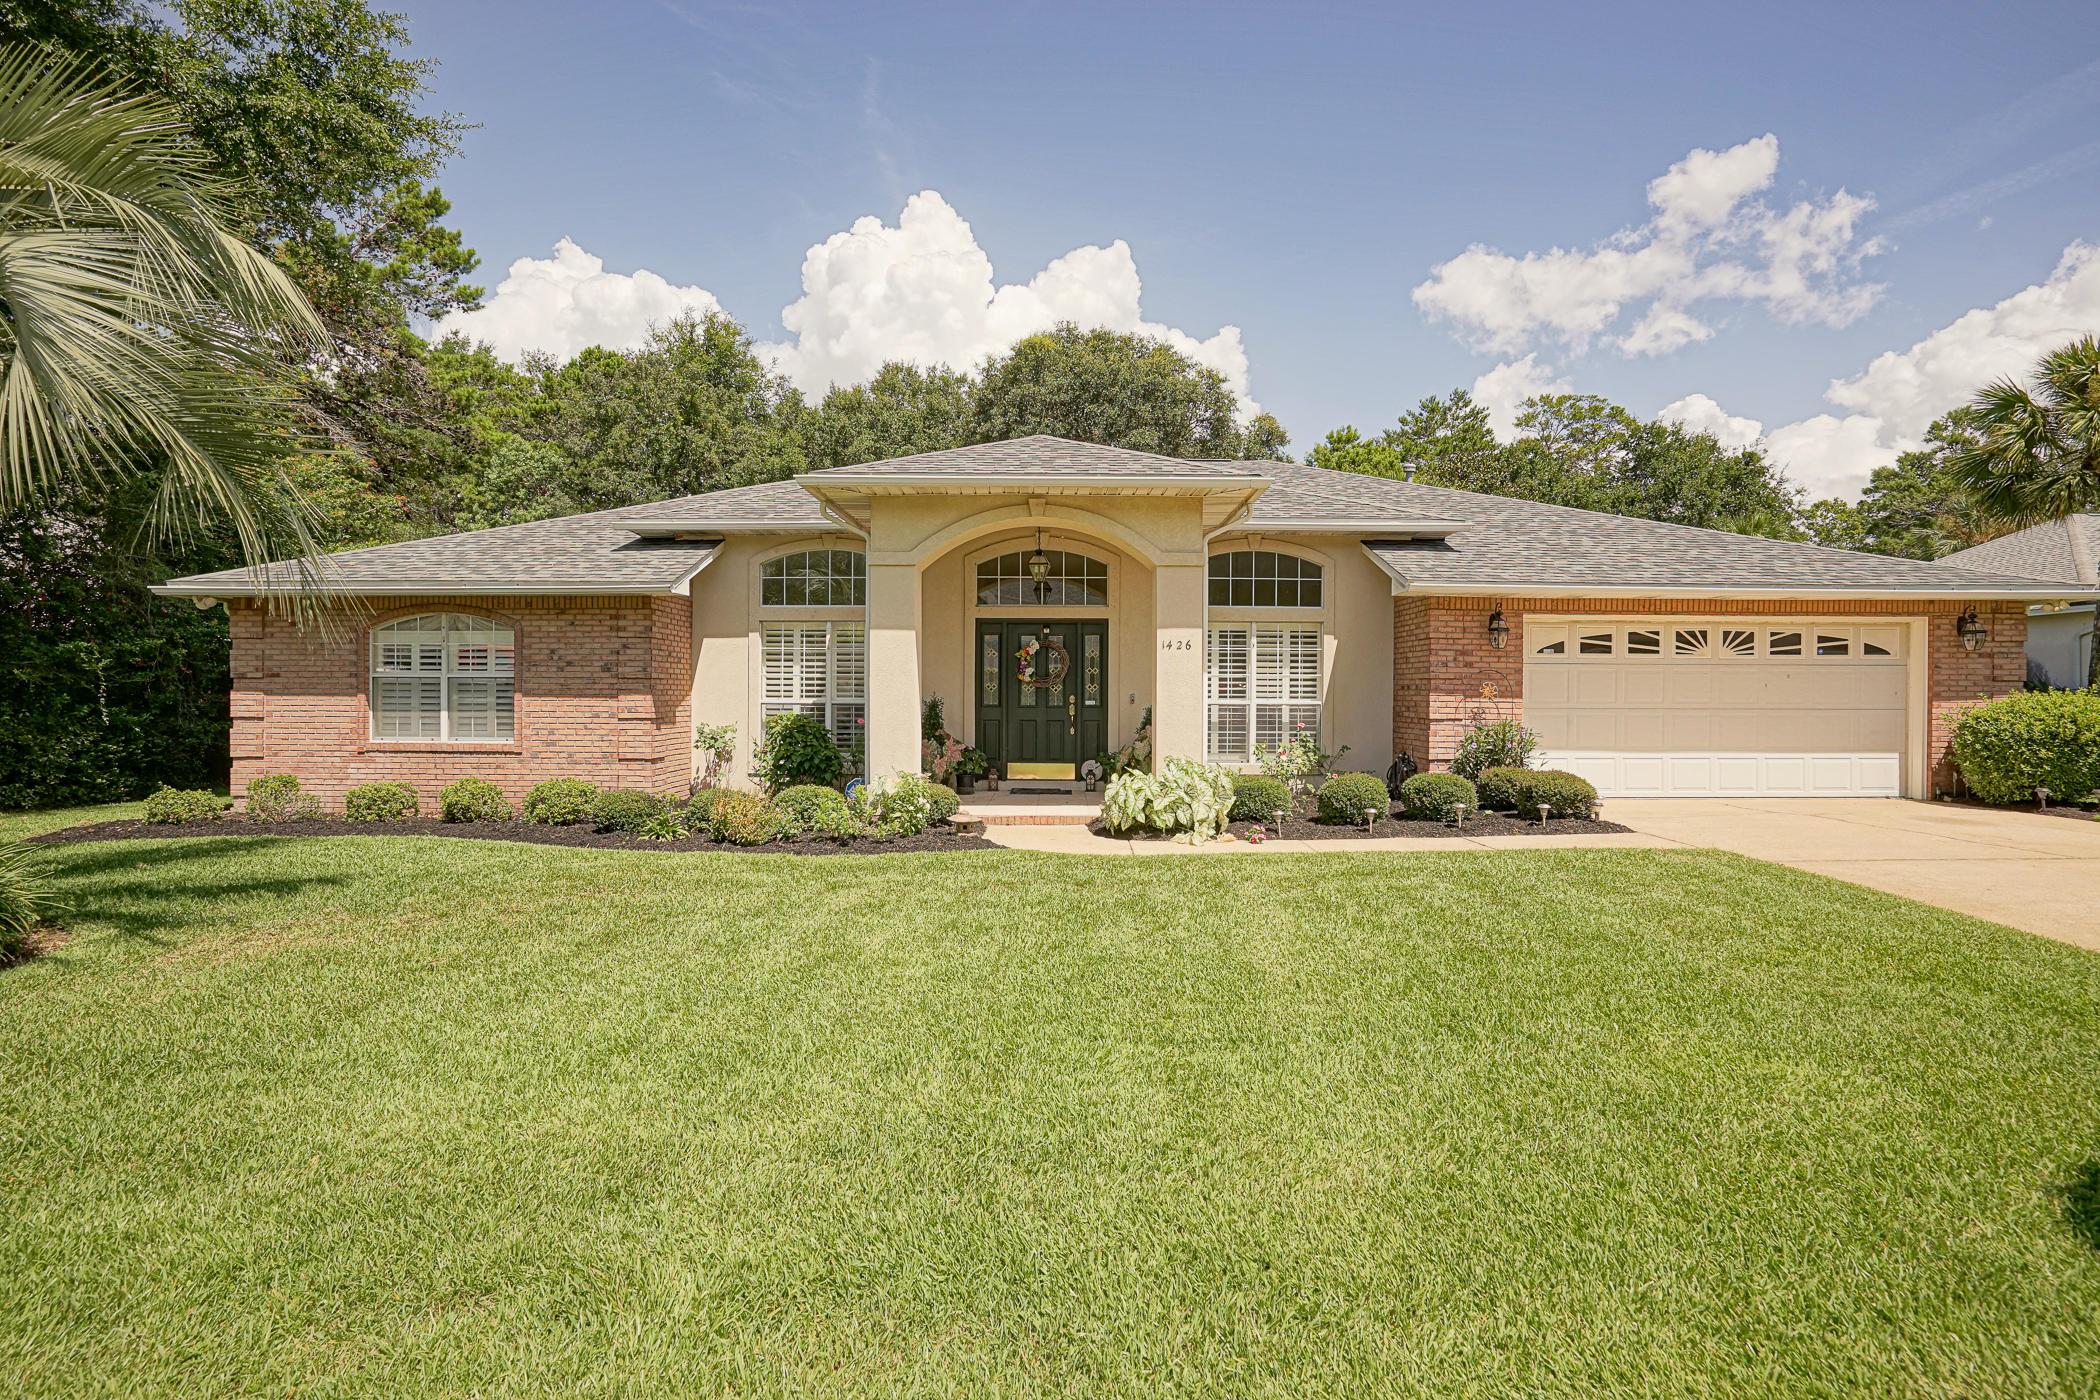 1426  William Faulkner Drive, Niceville in Okaloosa County, FL 32578 Home for Sale